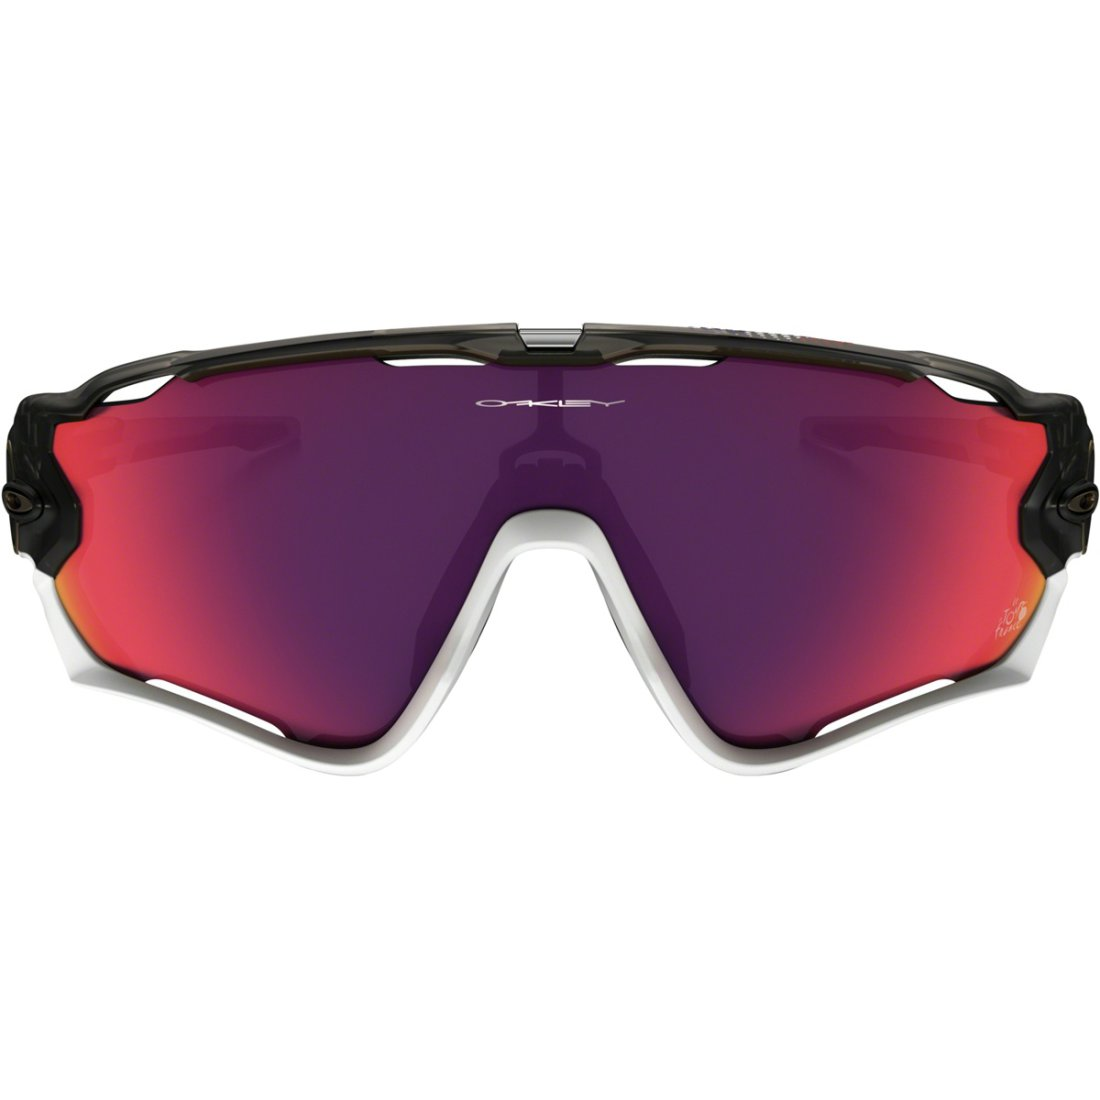 031c703fb9 OAKLEY Jawbreaker Tour de France Matte Gray Smoke   Prizm Road Mask   Goggle